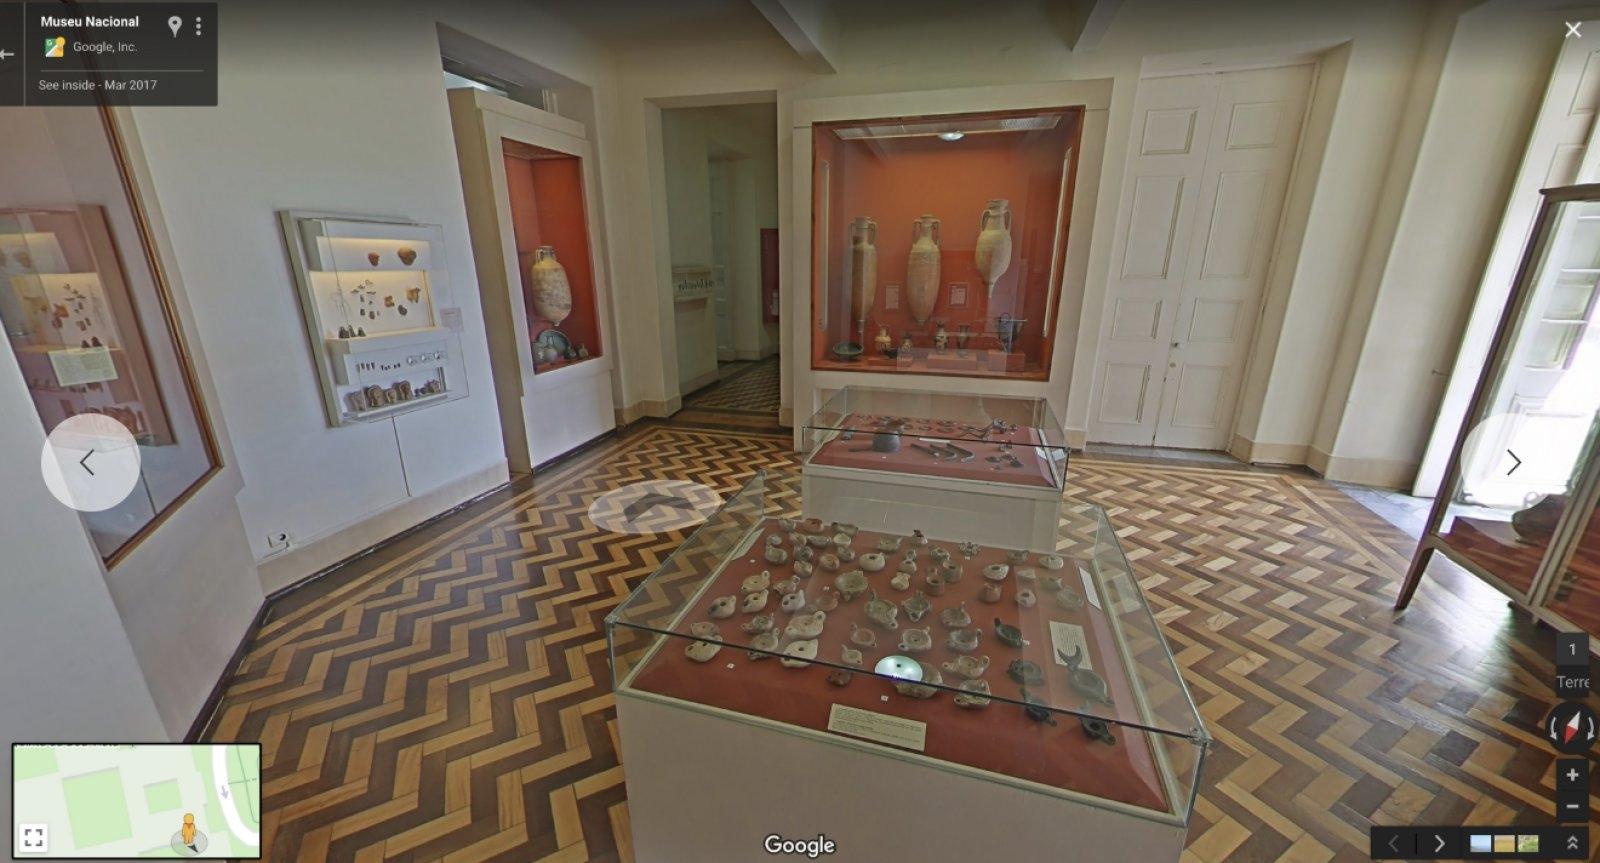 Google opens virtual version of fire-ravaged Brazil museum | DeviceDaily.com